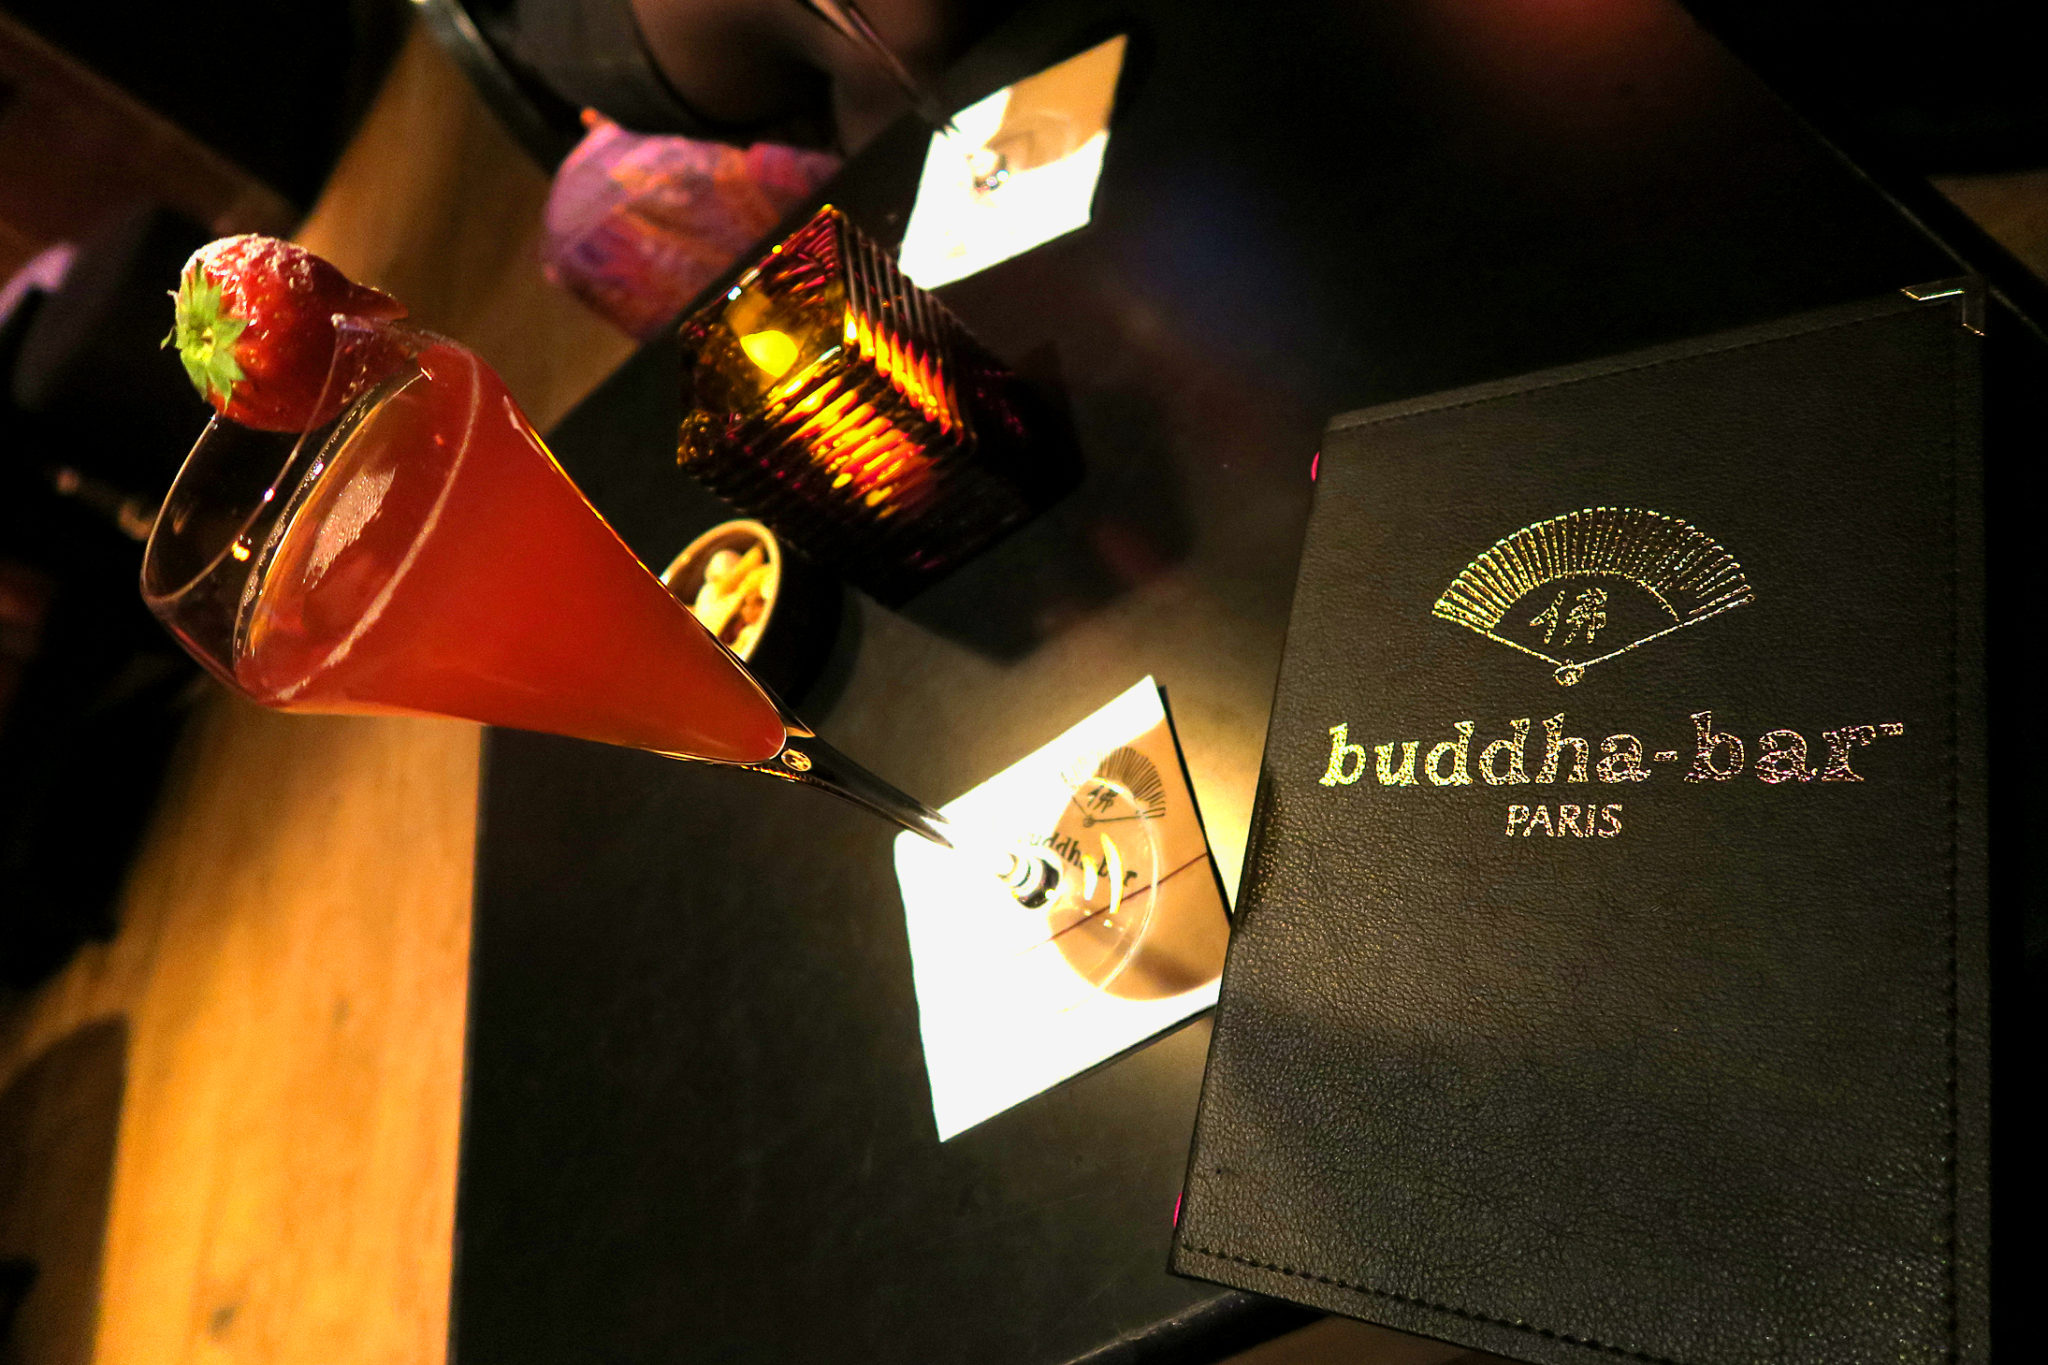 Hemaposesesvalises_buddha_bar_paris_cocktail_sortie_adresse